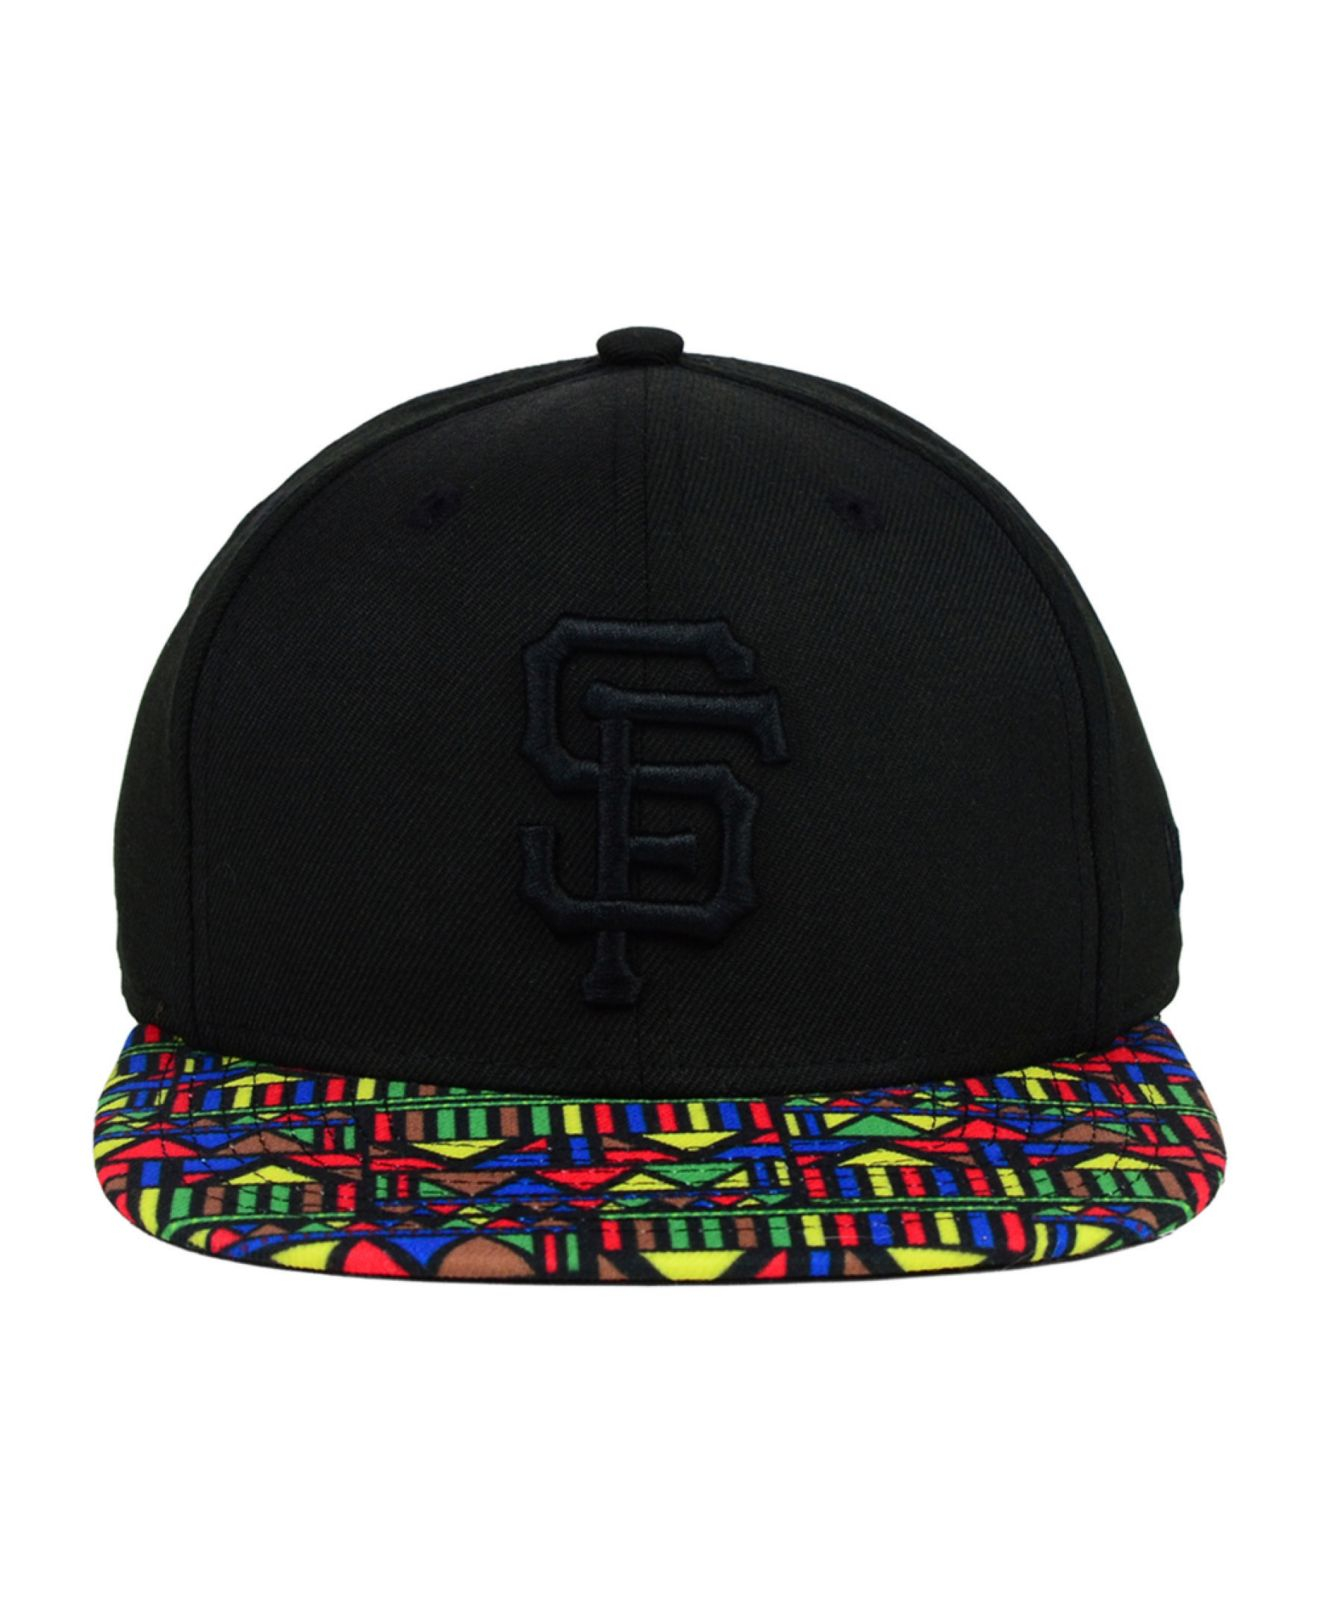 buy online 68da3 13997 KTZ San Francisco Giants Mlb Viza Hook 9Fifty Snapback Cap in Black ...